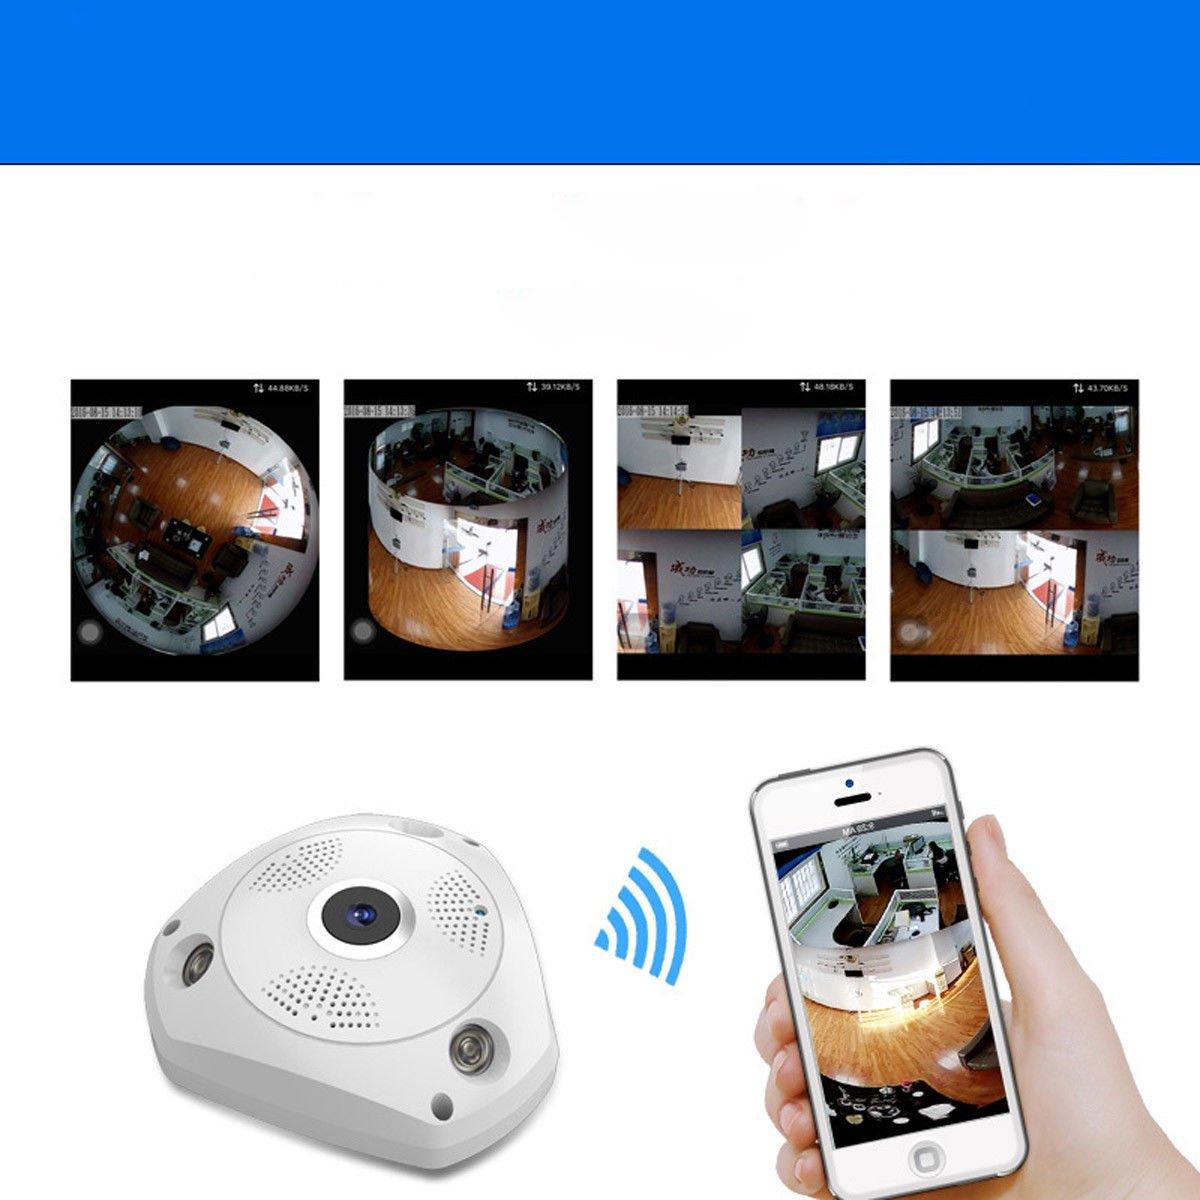 360° Panoramic Wireless IP Camera, ixaer HD Security Fish-Eye Lens WiFi Security Surveillance Camera VR 3D Home Security IP Camera